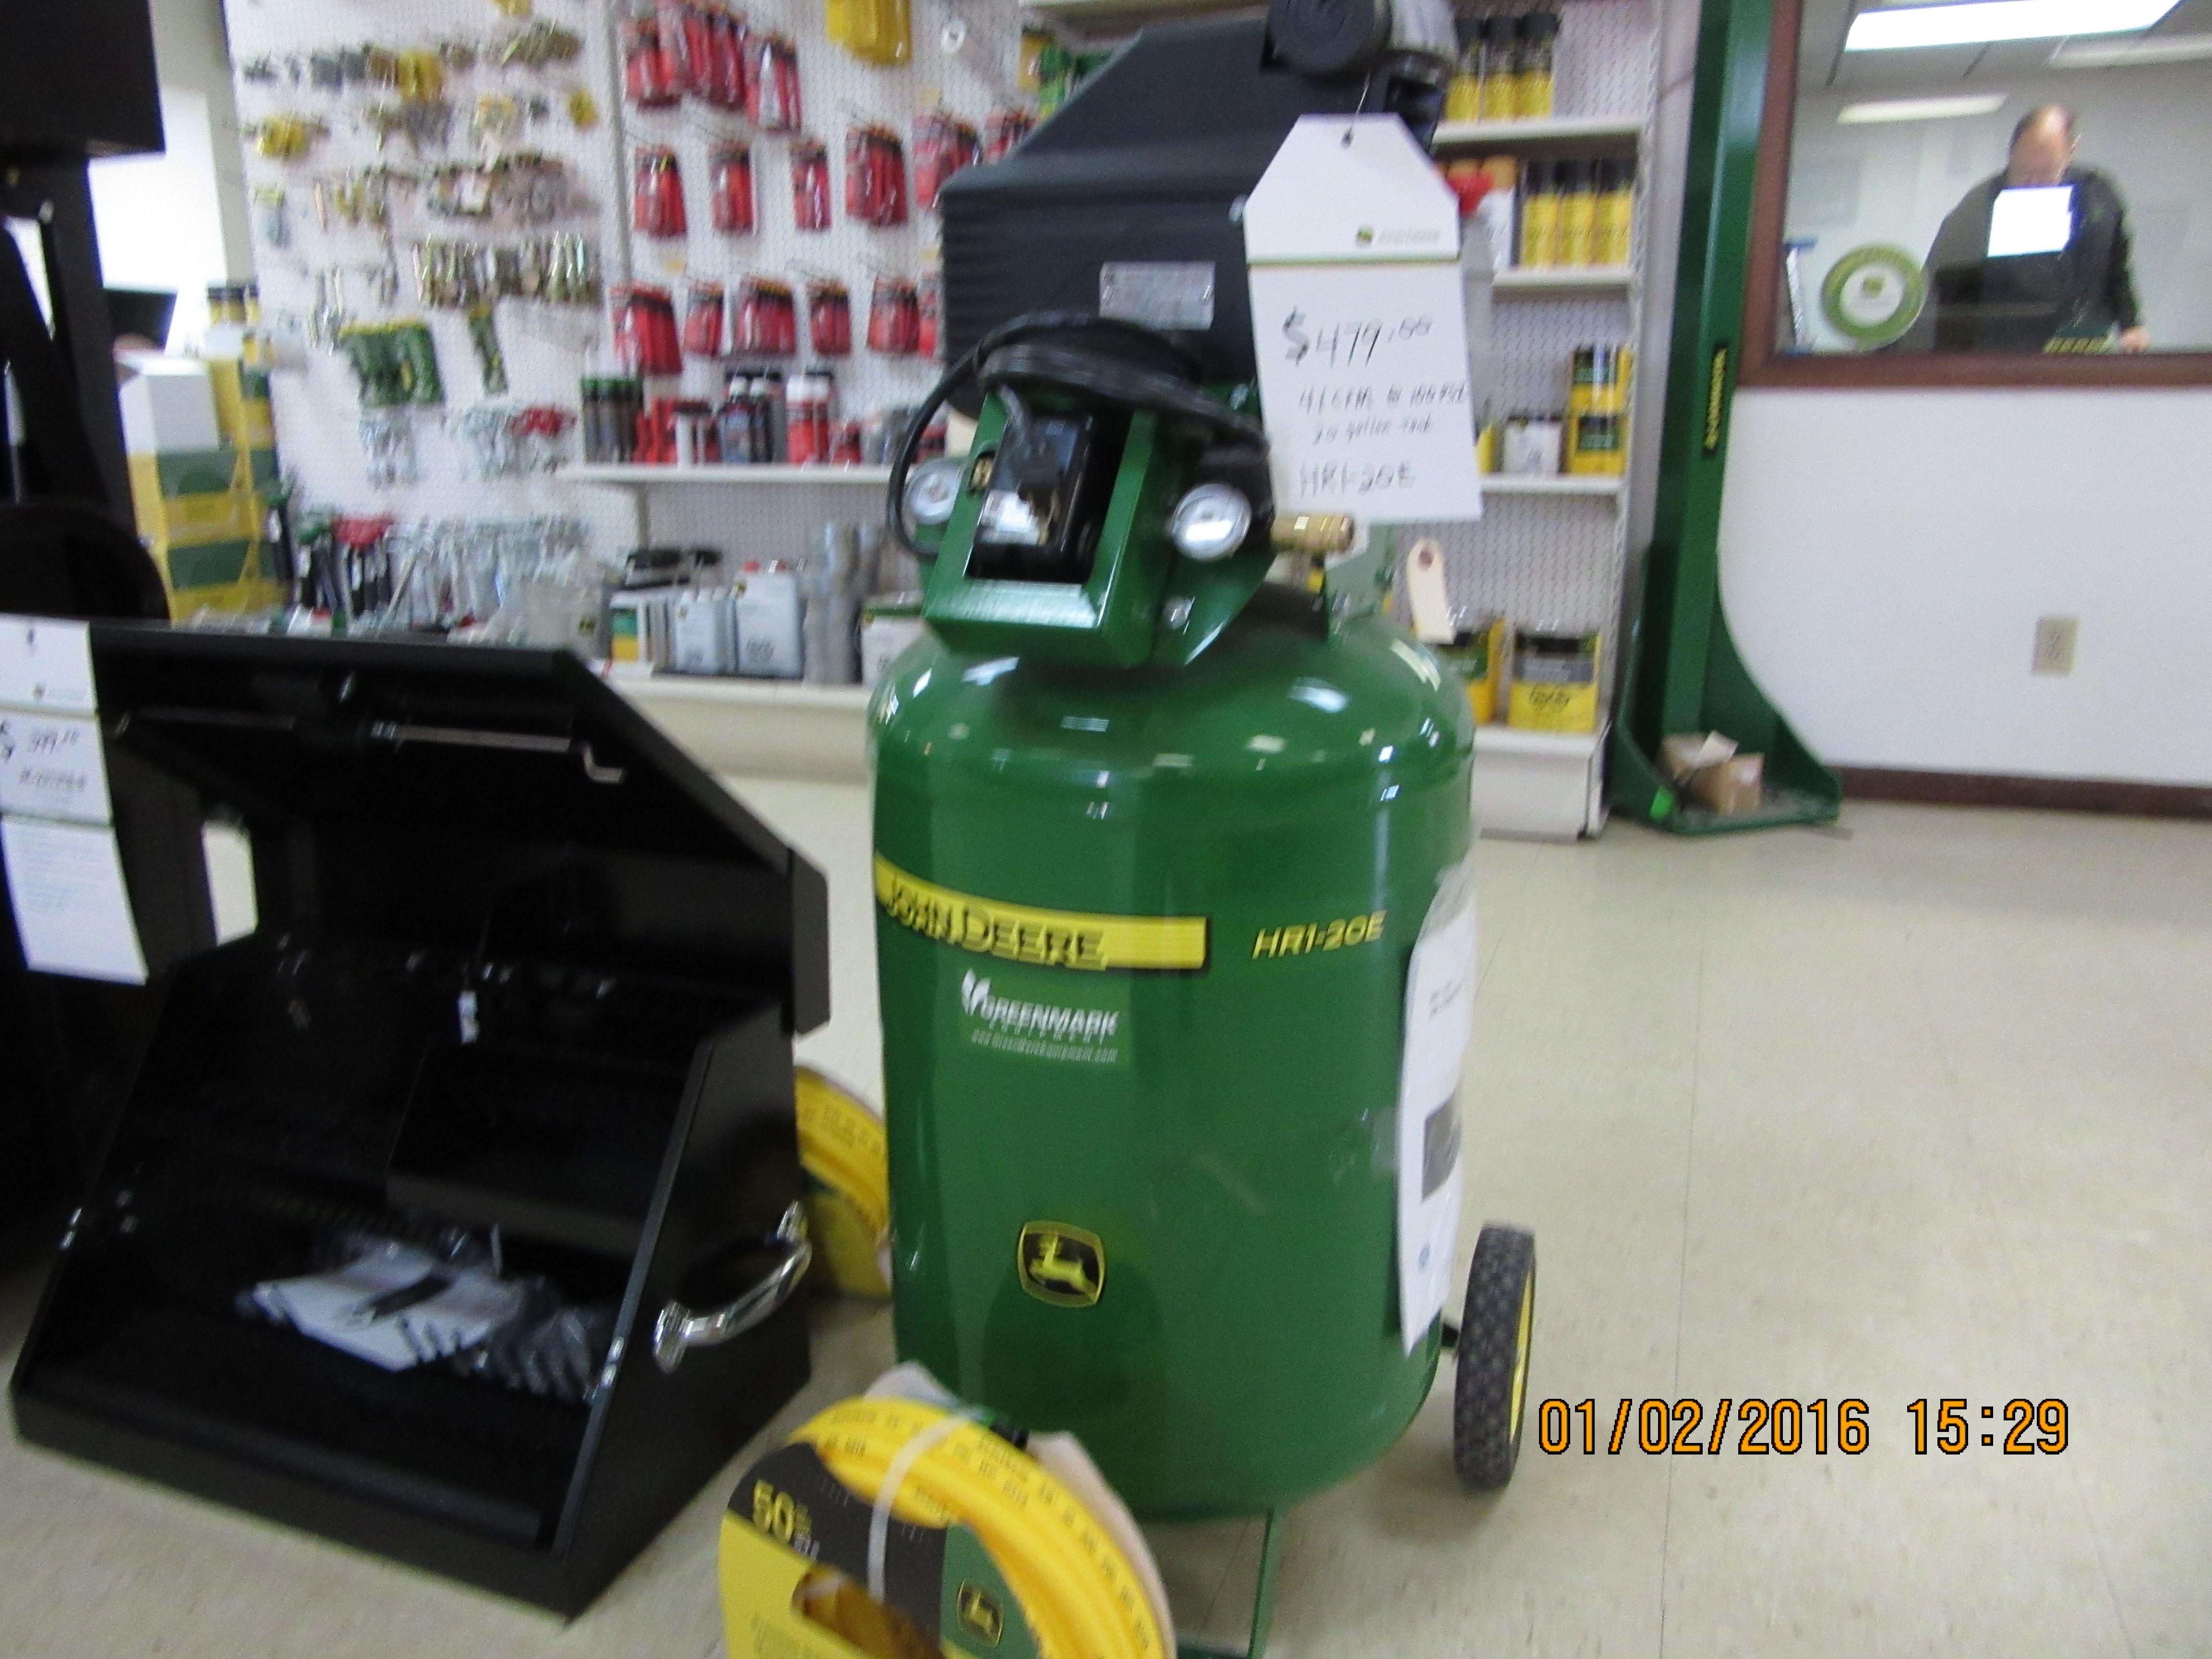 John Deere Air Compressor Ebay >> John Deere Hr1 20e Air Compressor Inside Greenmark Equipment John